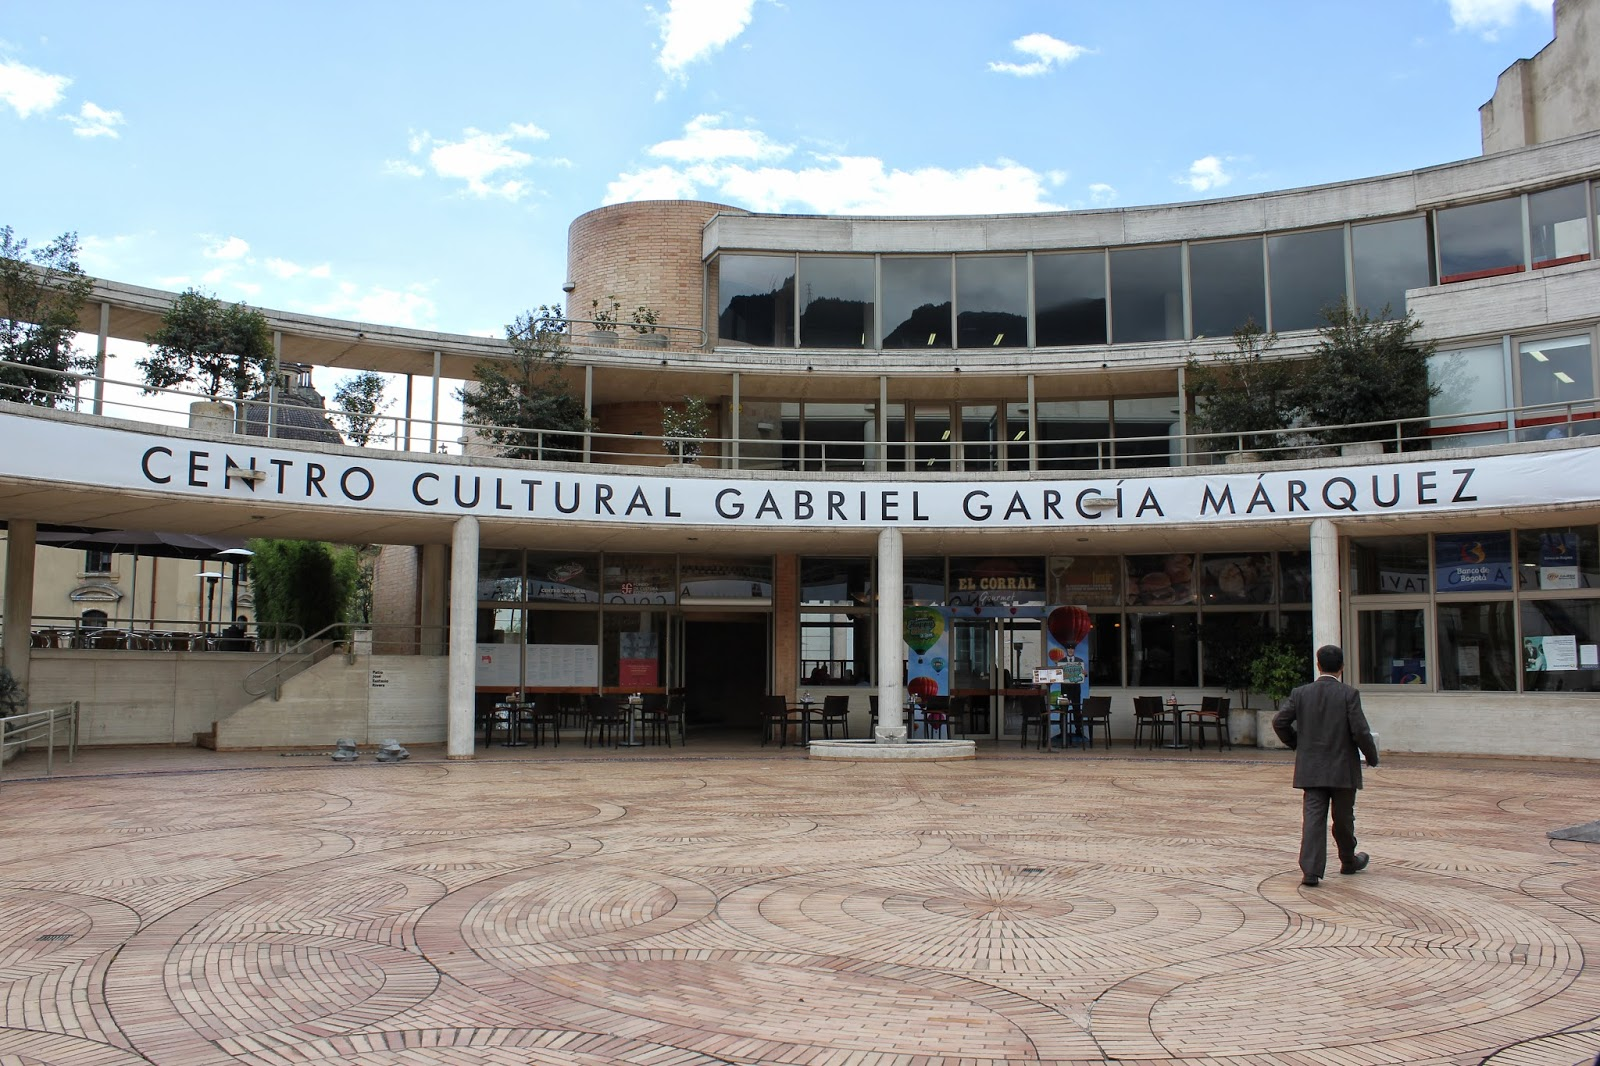 gabriel gracia marquez thesis Home » buku sastra » gabriel garcia marquez » kumpulan cerpen » mario vargas llosa » octavio paz » penerbit pinus » yukio mishima » jual buku ajal bergeming di.